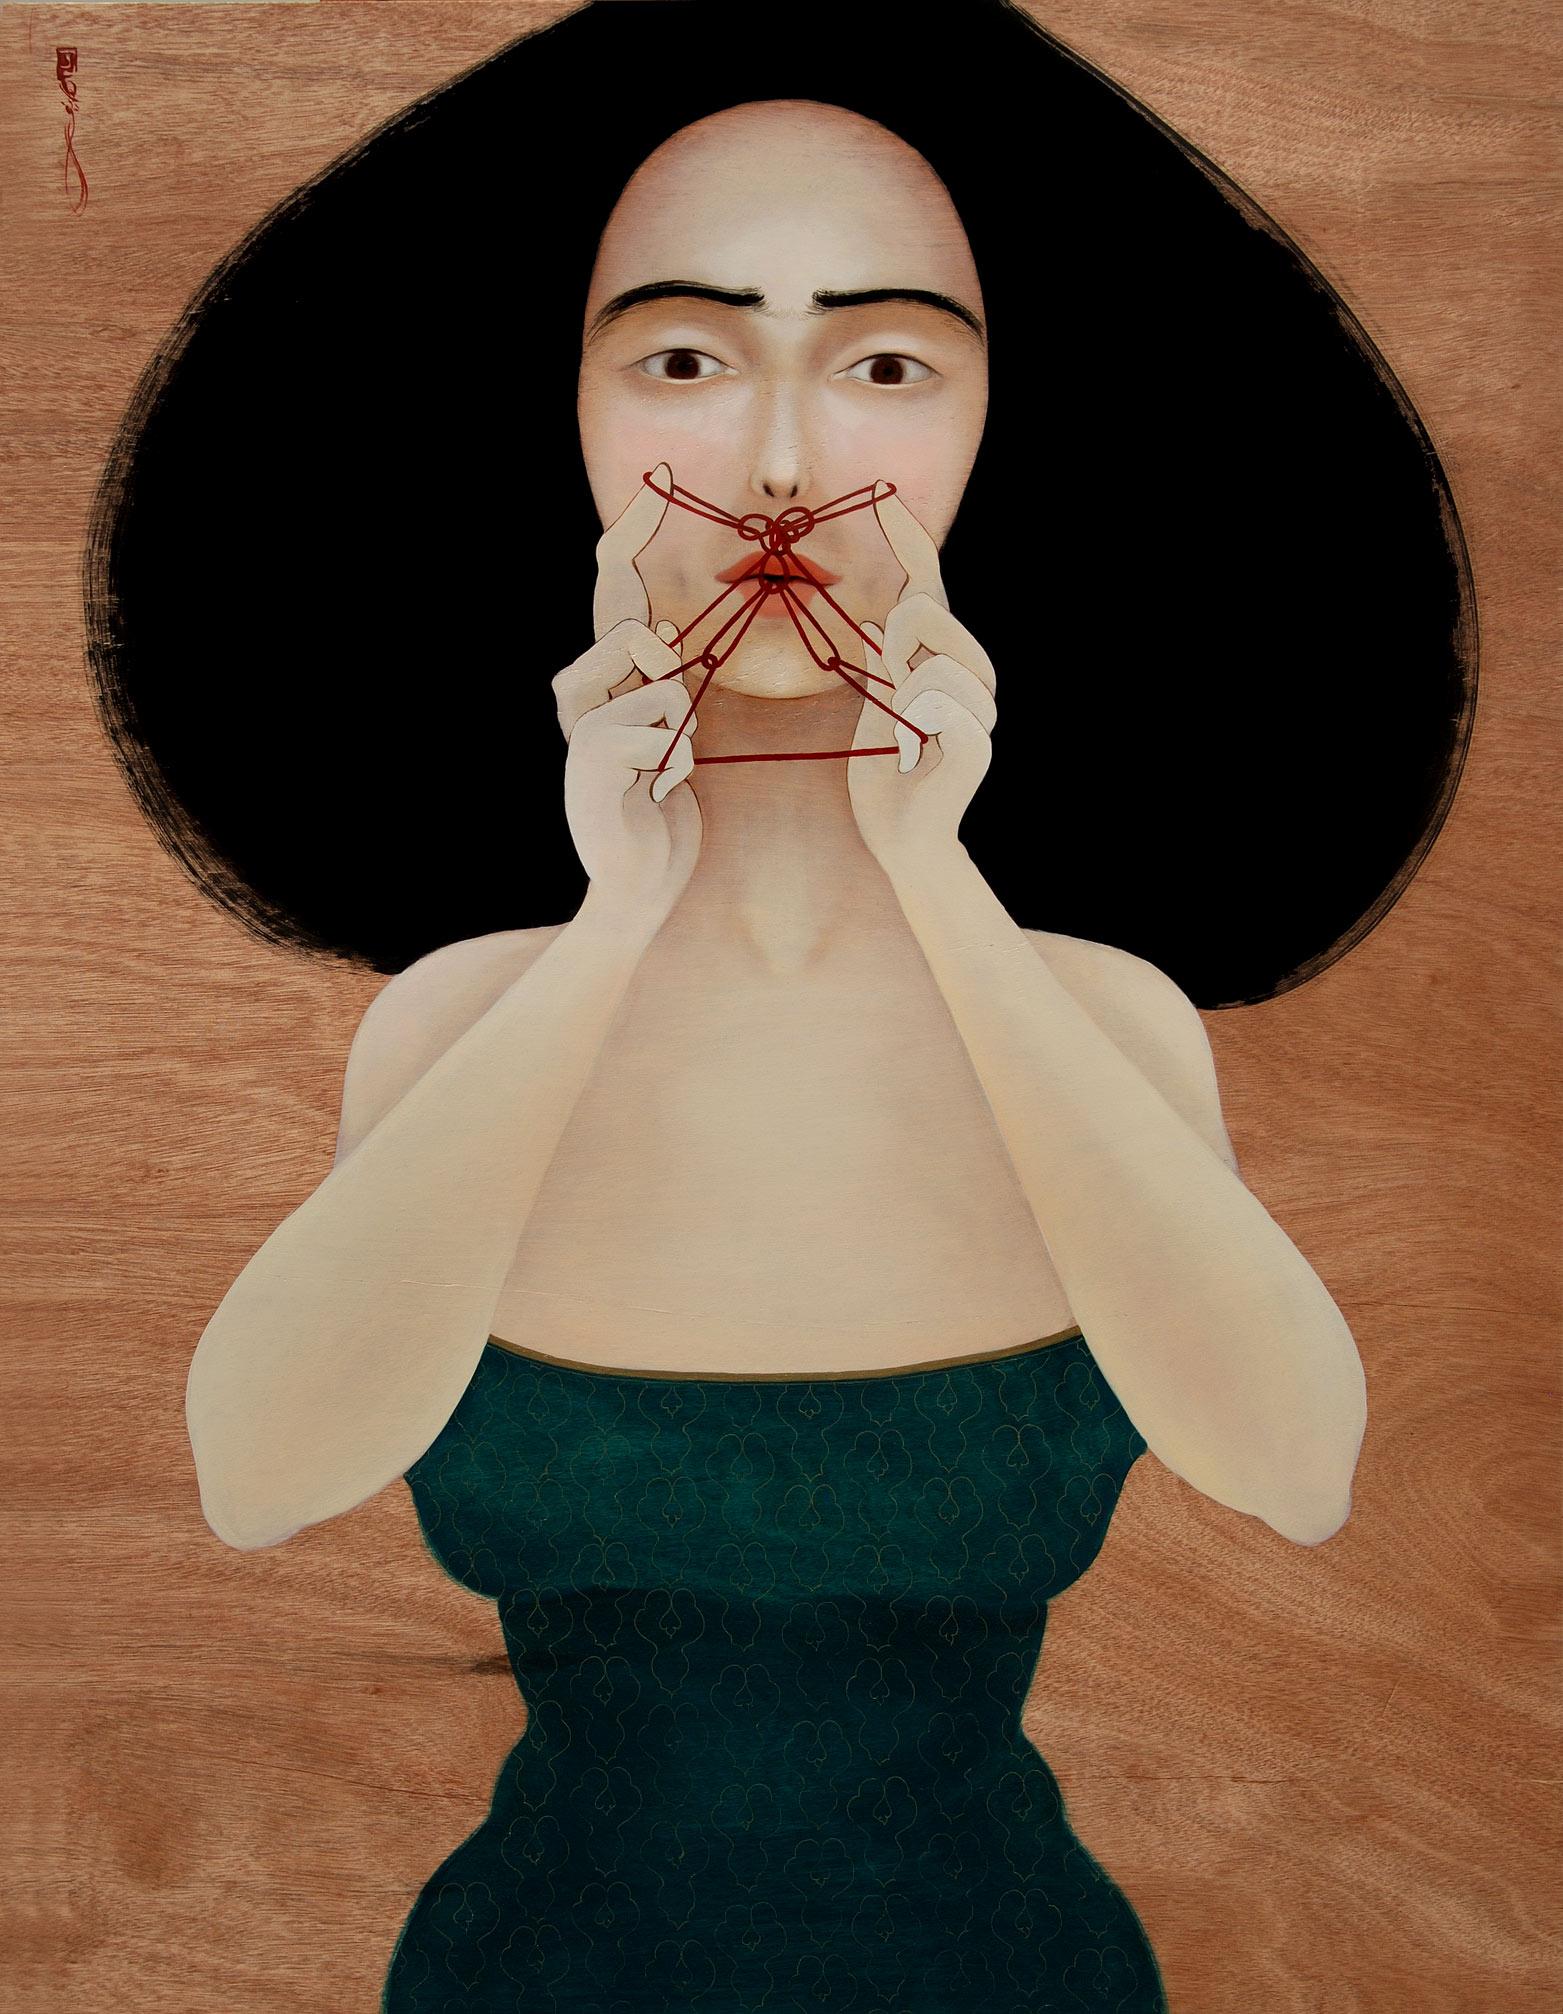 HK_Threading My Mustache_2010_Oil on wooden panel_112x87cm_650.jpg